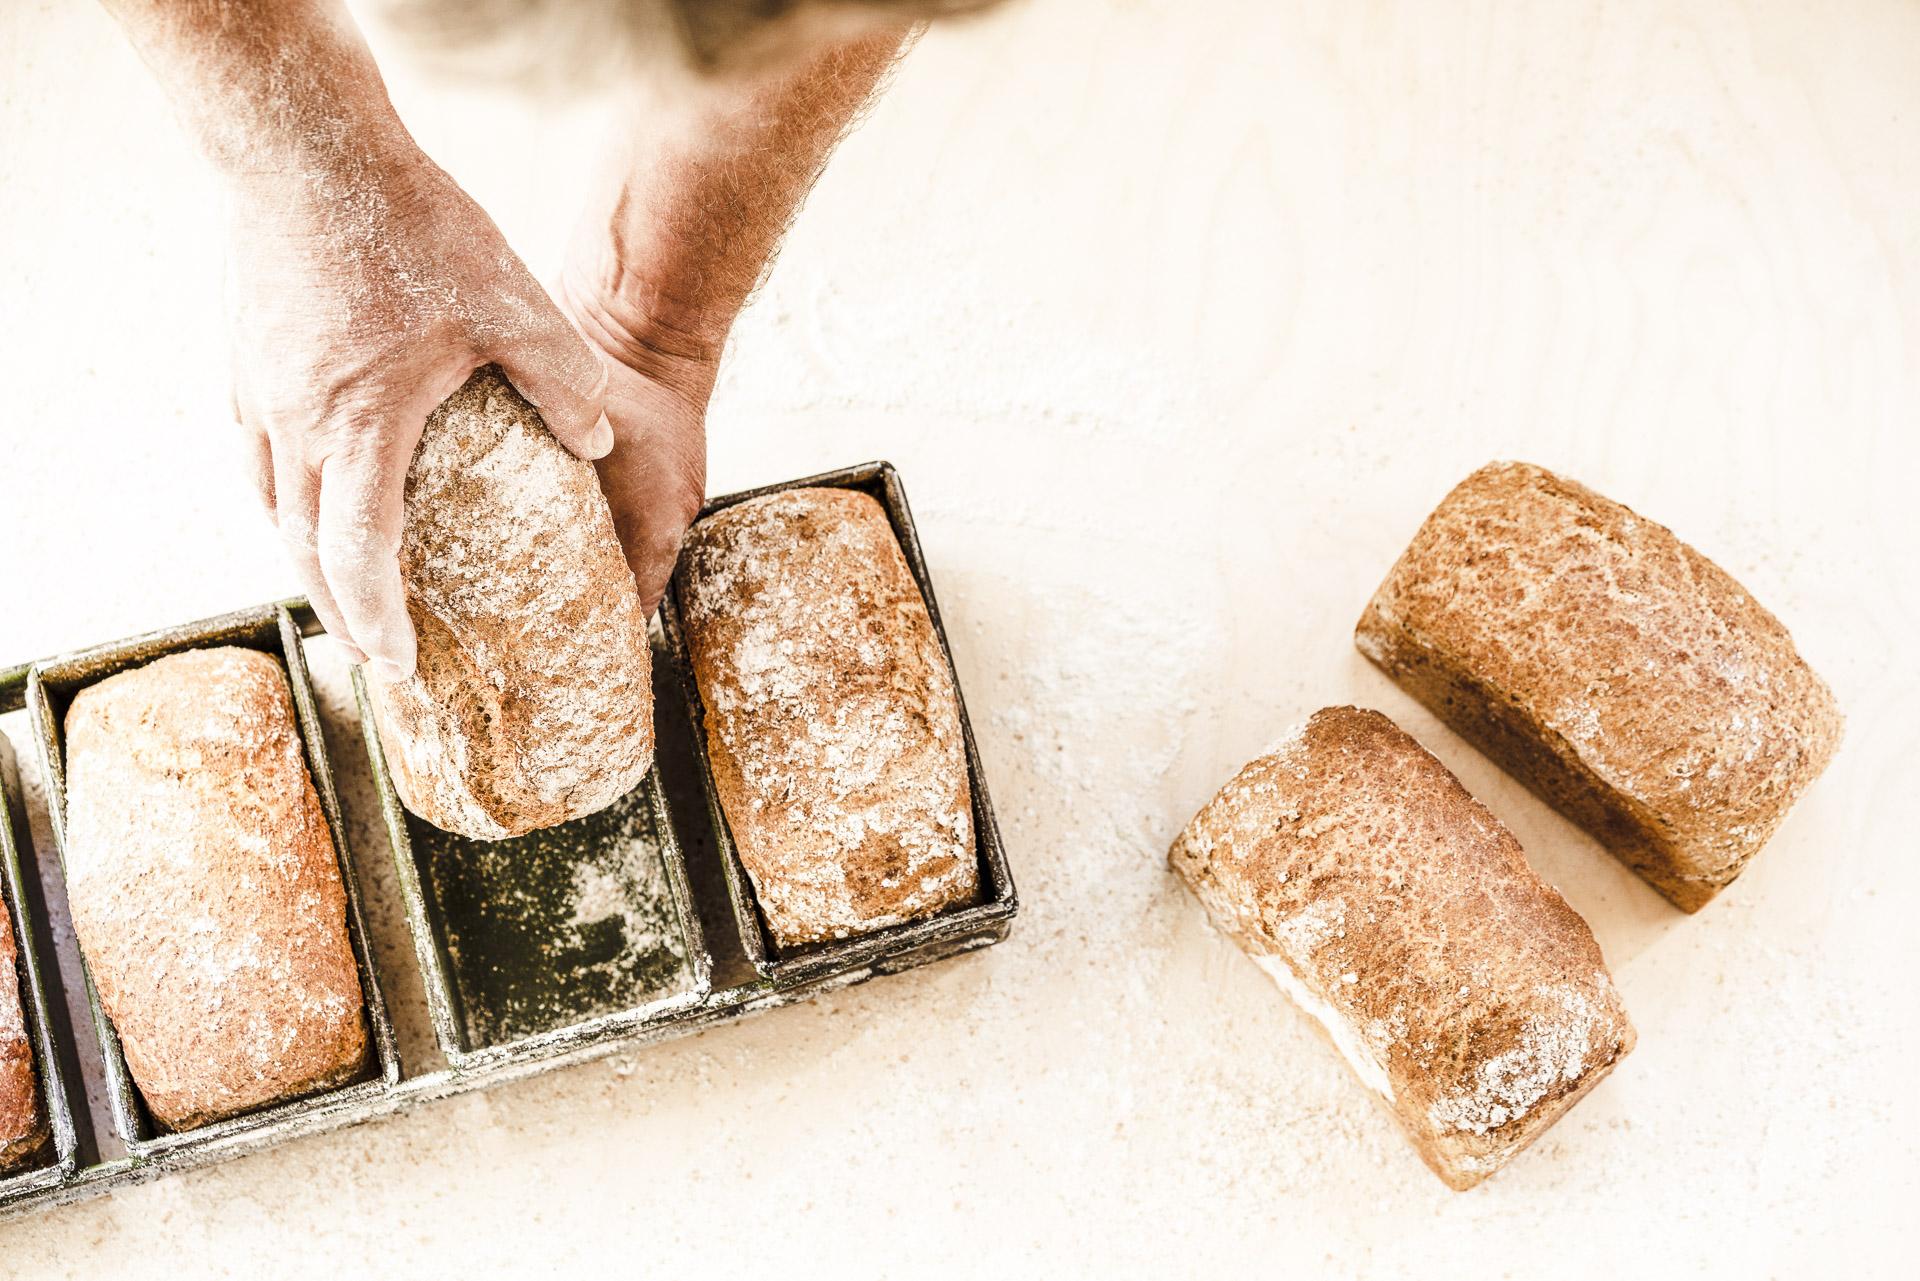 Fotowerk Foodfotografie - Dinkelbrot